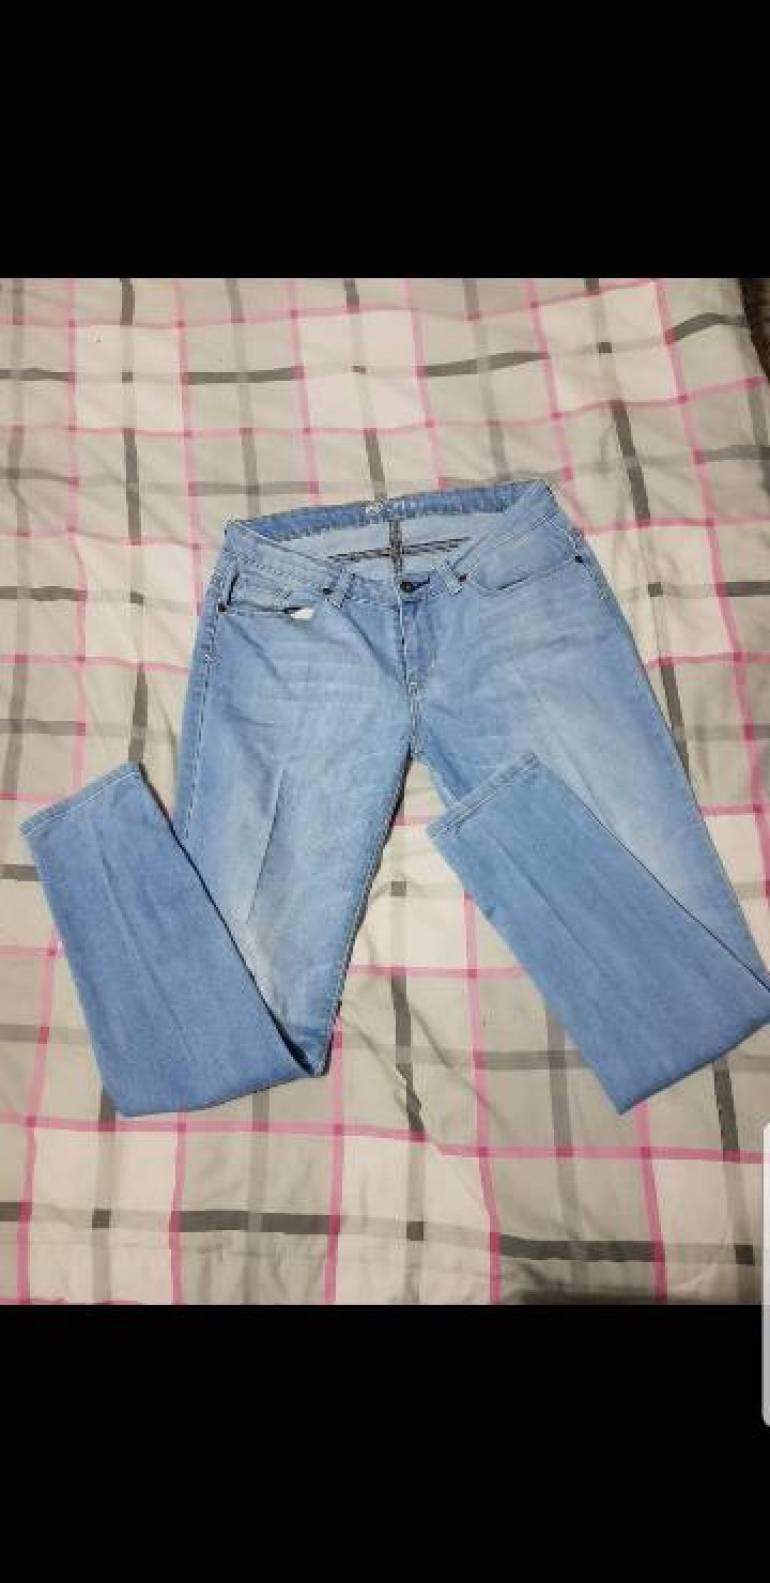 2x1 pantalon azul de C&A de segunda mano - GoTrendier